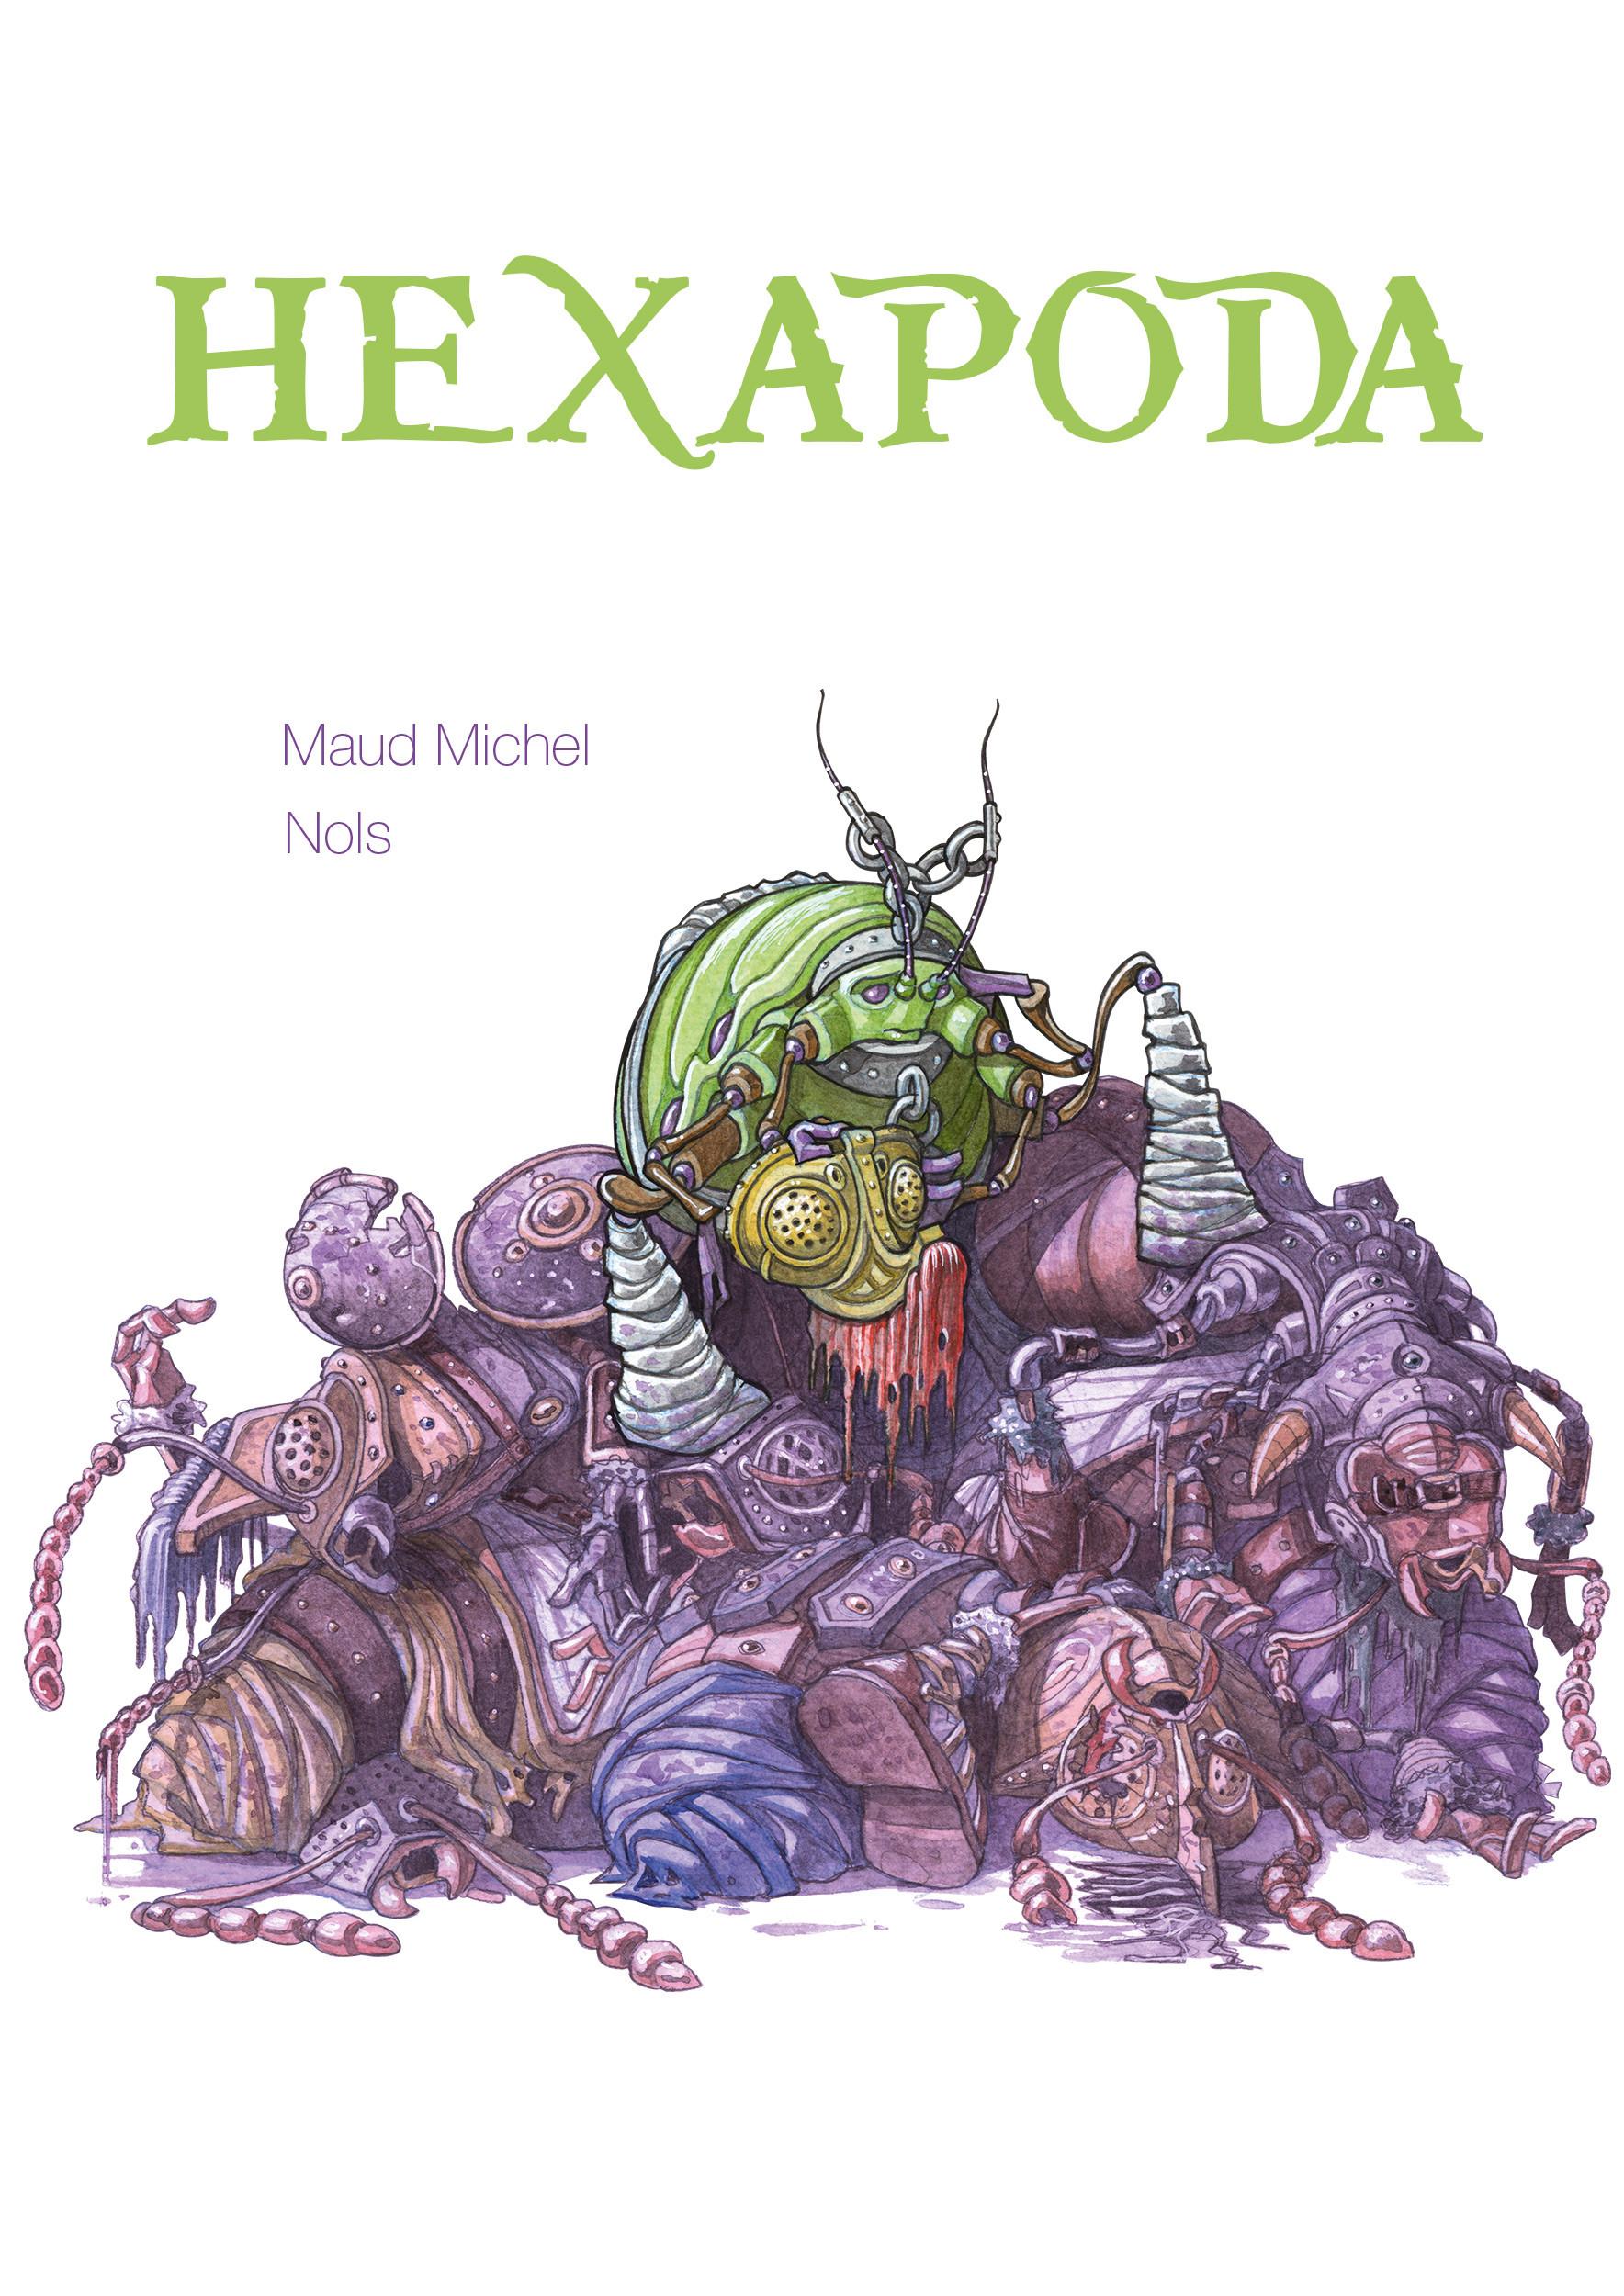 Signarbieux nicolas hexapoda couv